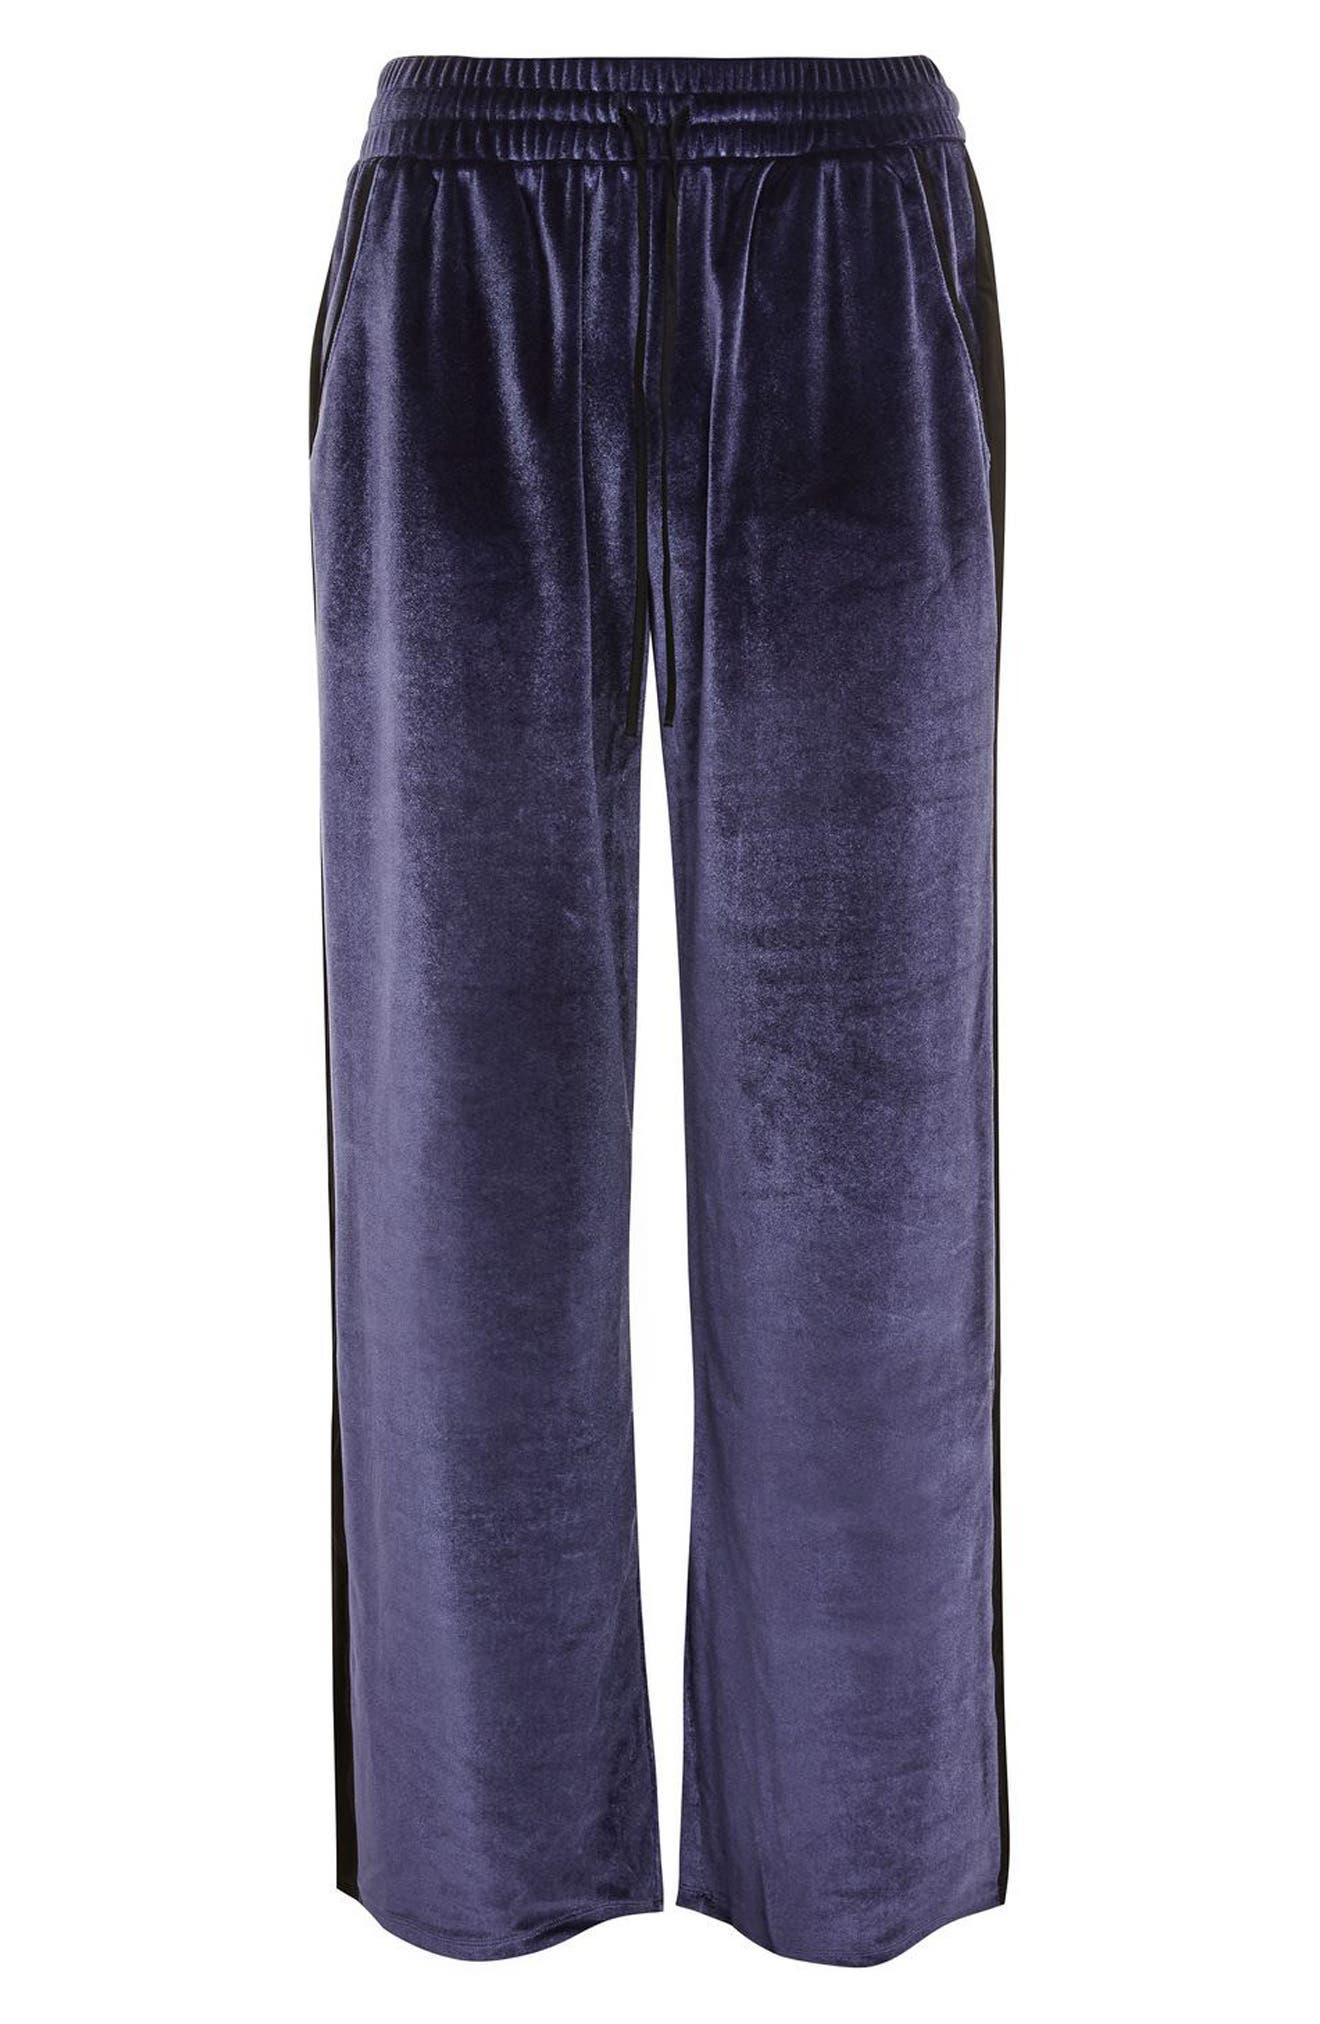 Nocturne Velvet Pajama Pants,                             Alternate thumbnail 3, color,                             410